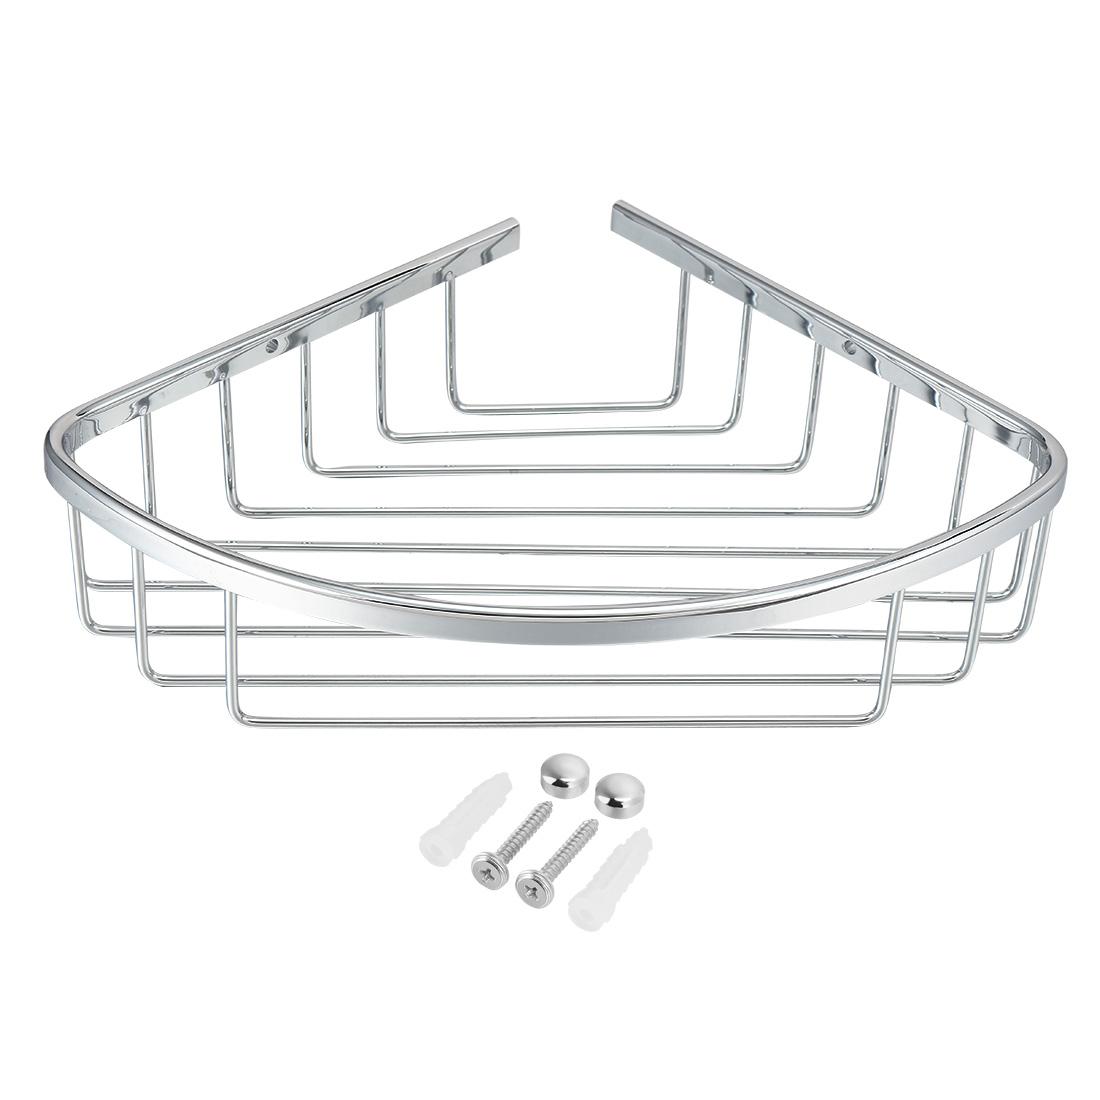 10.3-inch x 7.6-inch Brass Bathroom Basket Shower Caddy Corner Shelf Storage